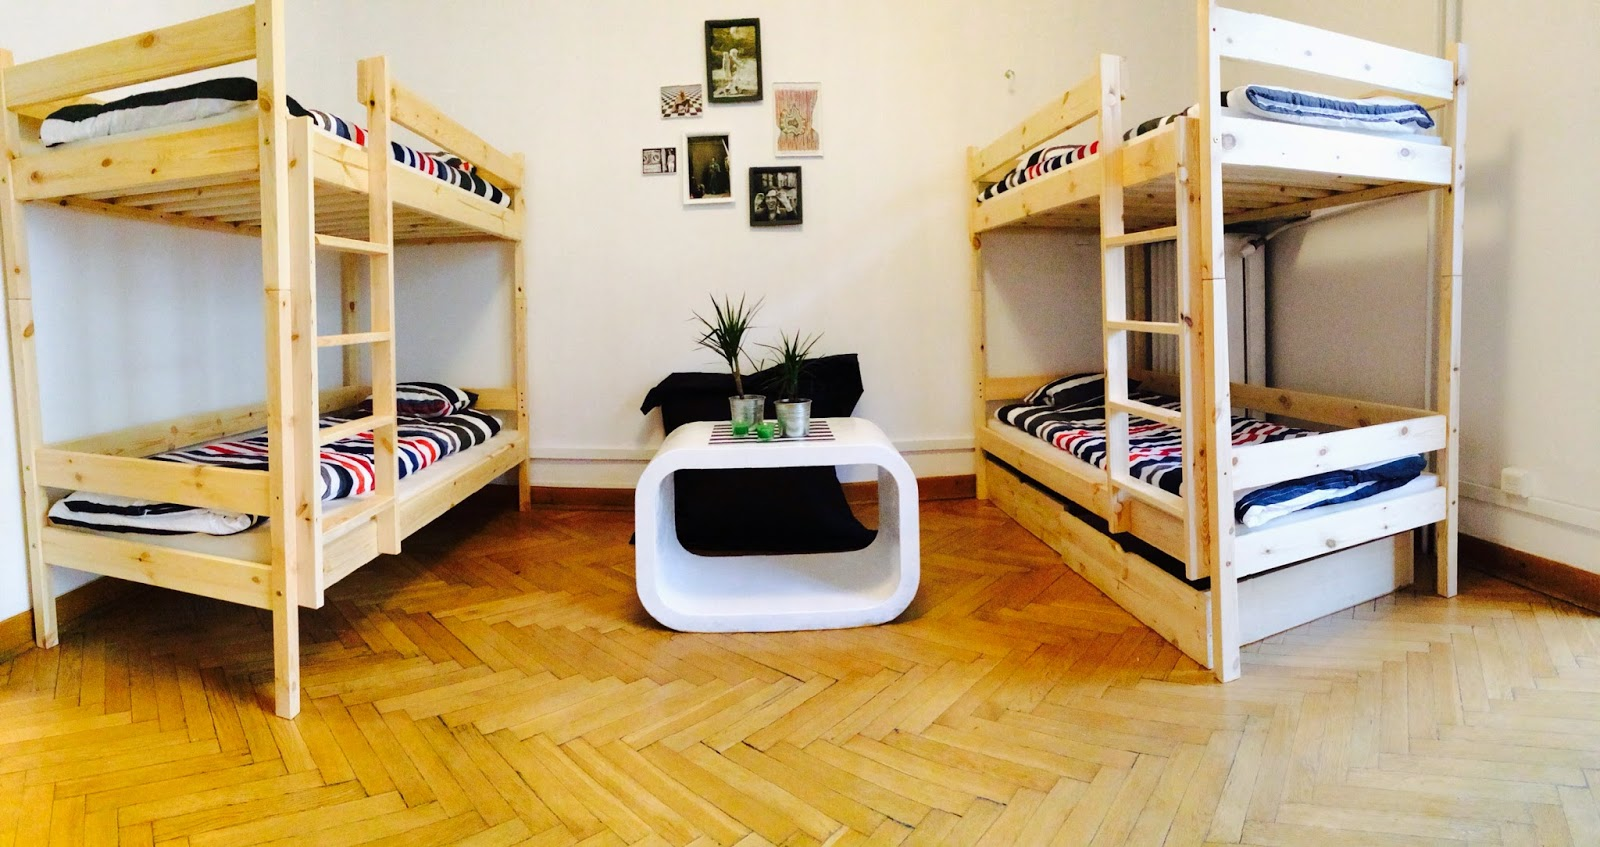 > Auberge de jeunesse Warsaw center hotel à Varsovie.